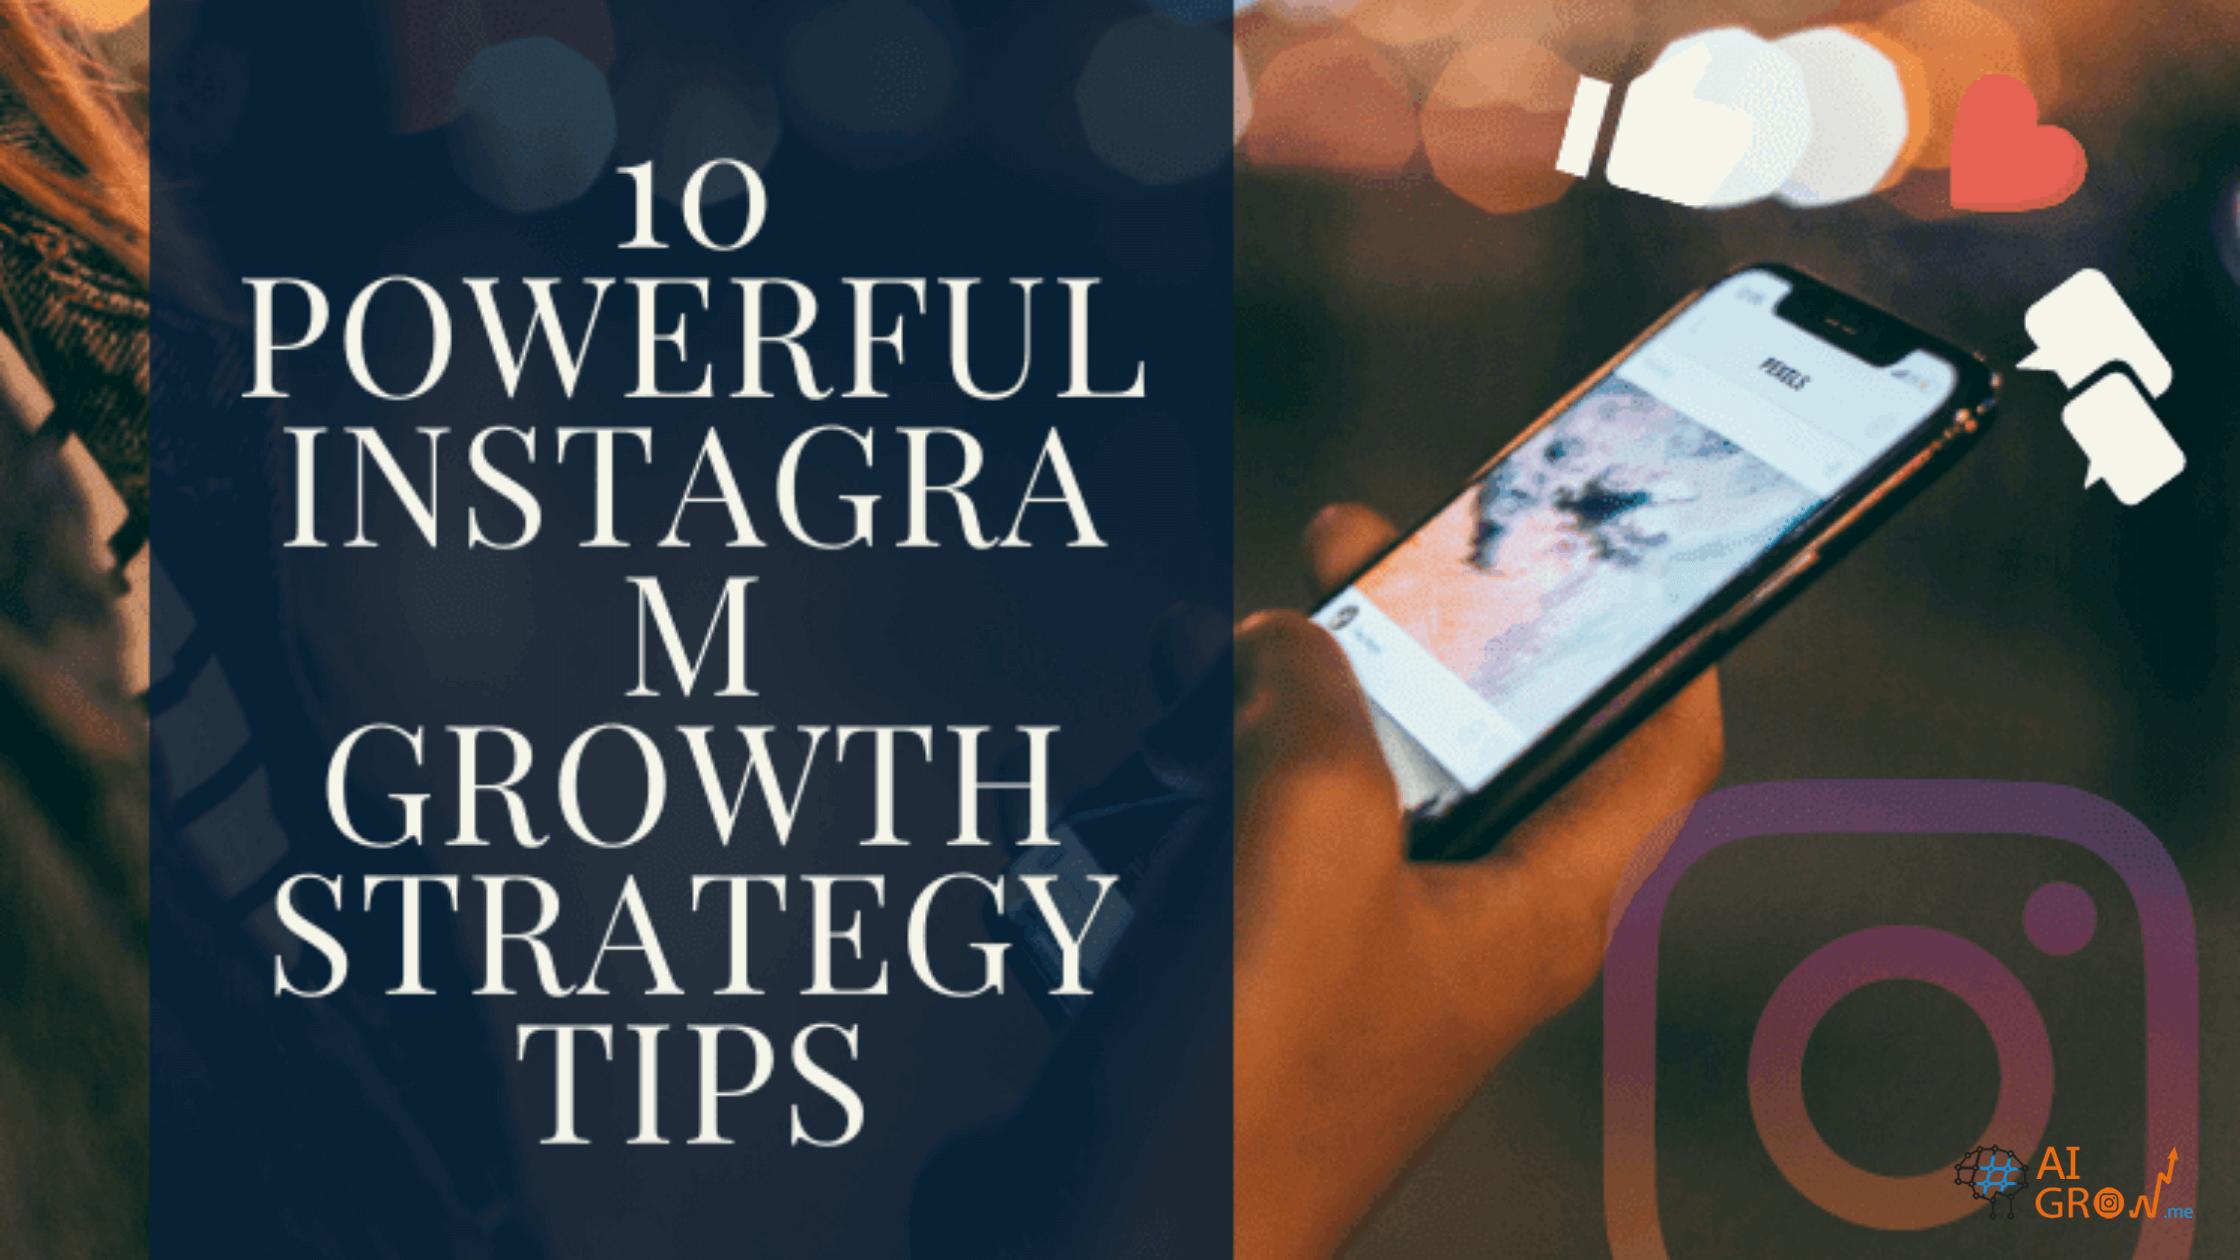 10 Powerful Instagram Growth Strategy Tips